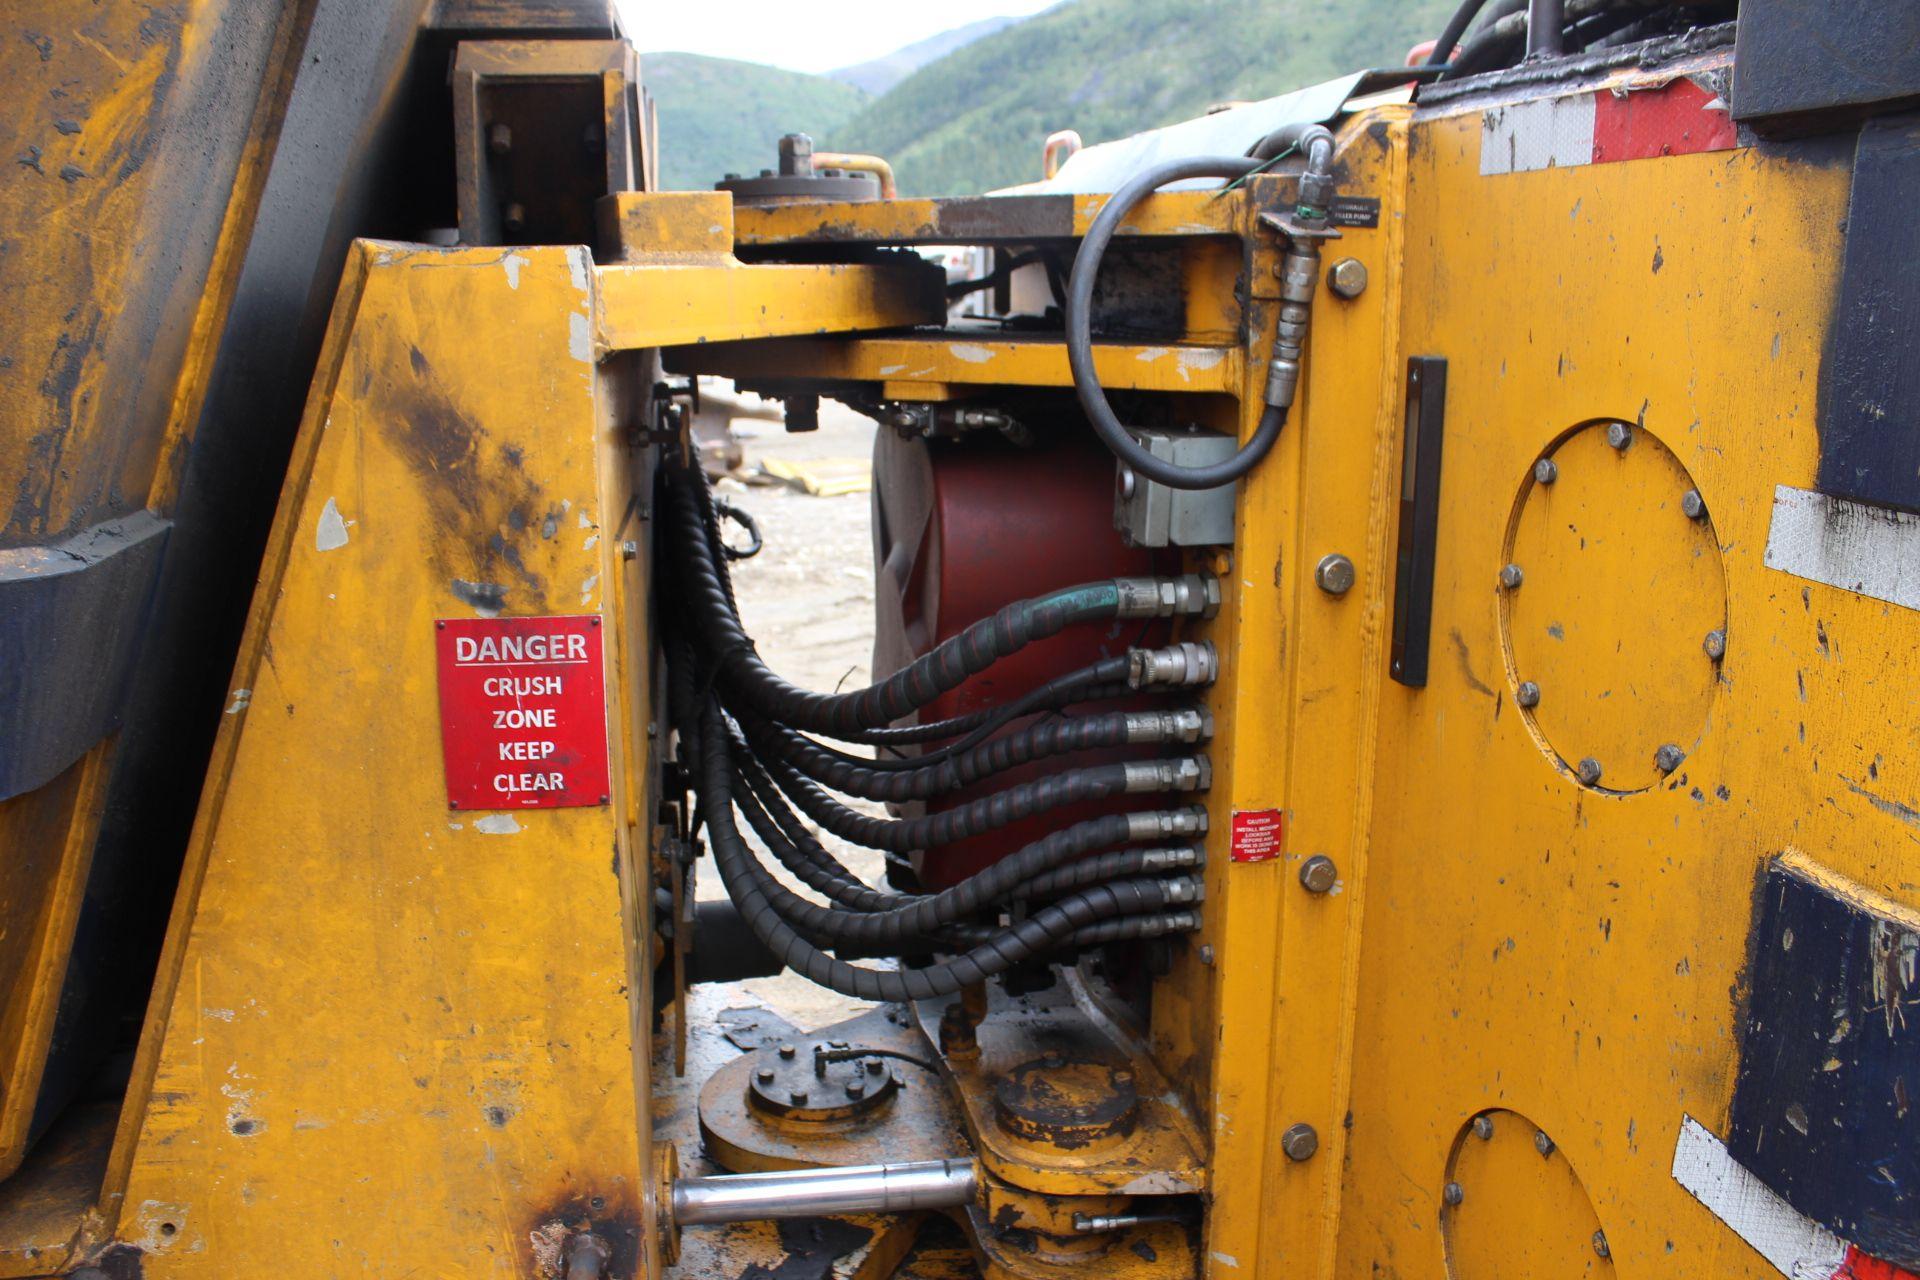 Lot 16 - 2014 RDH HM800?30 Mine Truck, 18.00-25 Tires; S/N 14-01315; Meter Shows 4,100 Hrs; (Unit MT003);